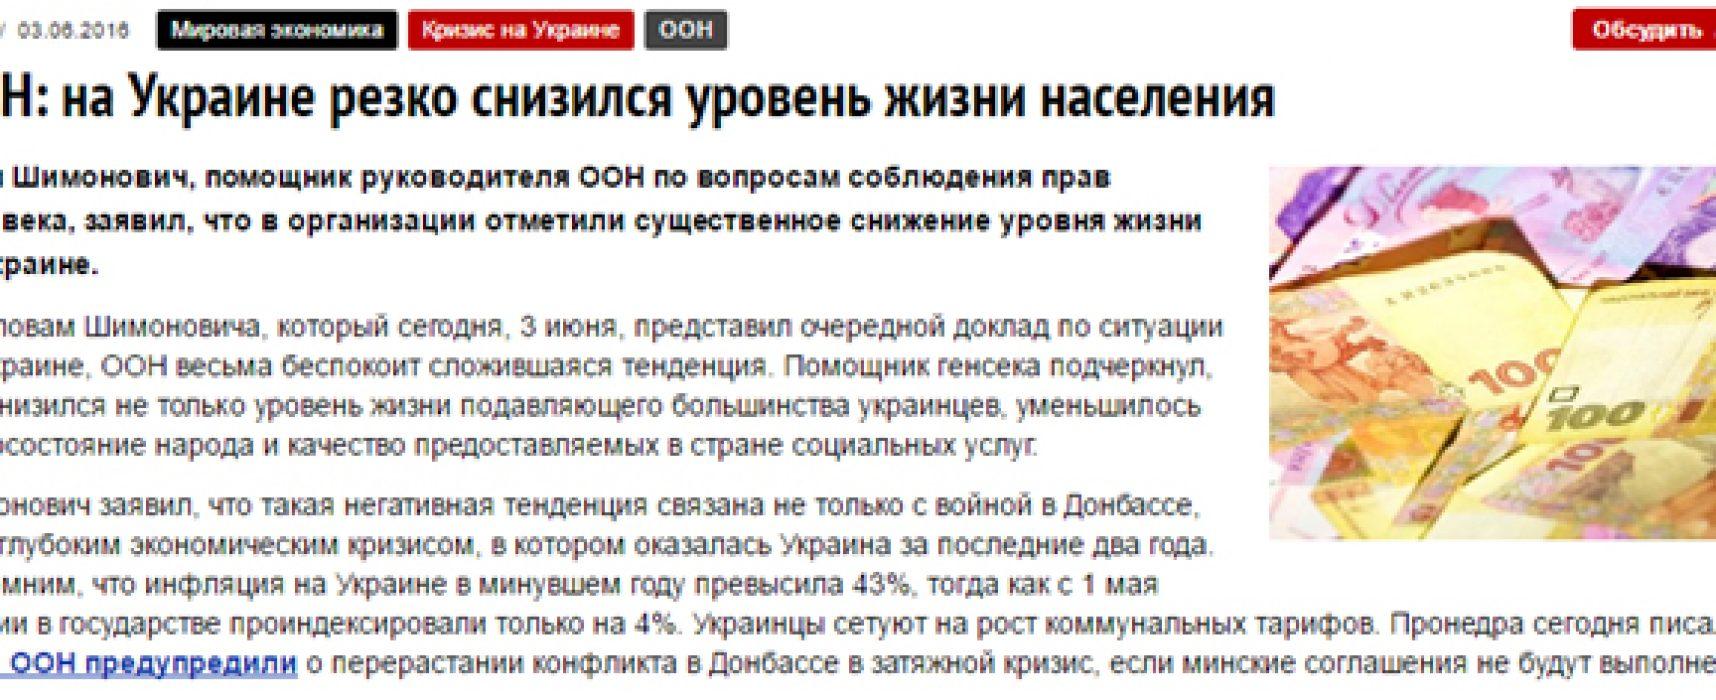 TASS: UN Concerned about Falling Ukrainian Standard of Living